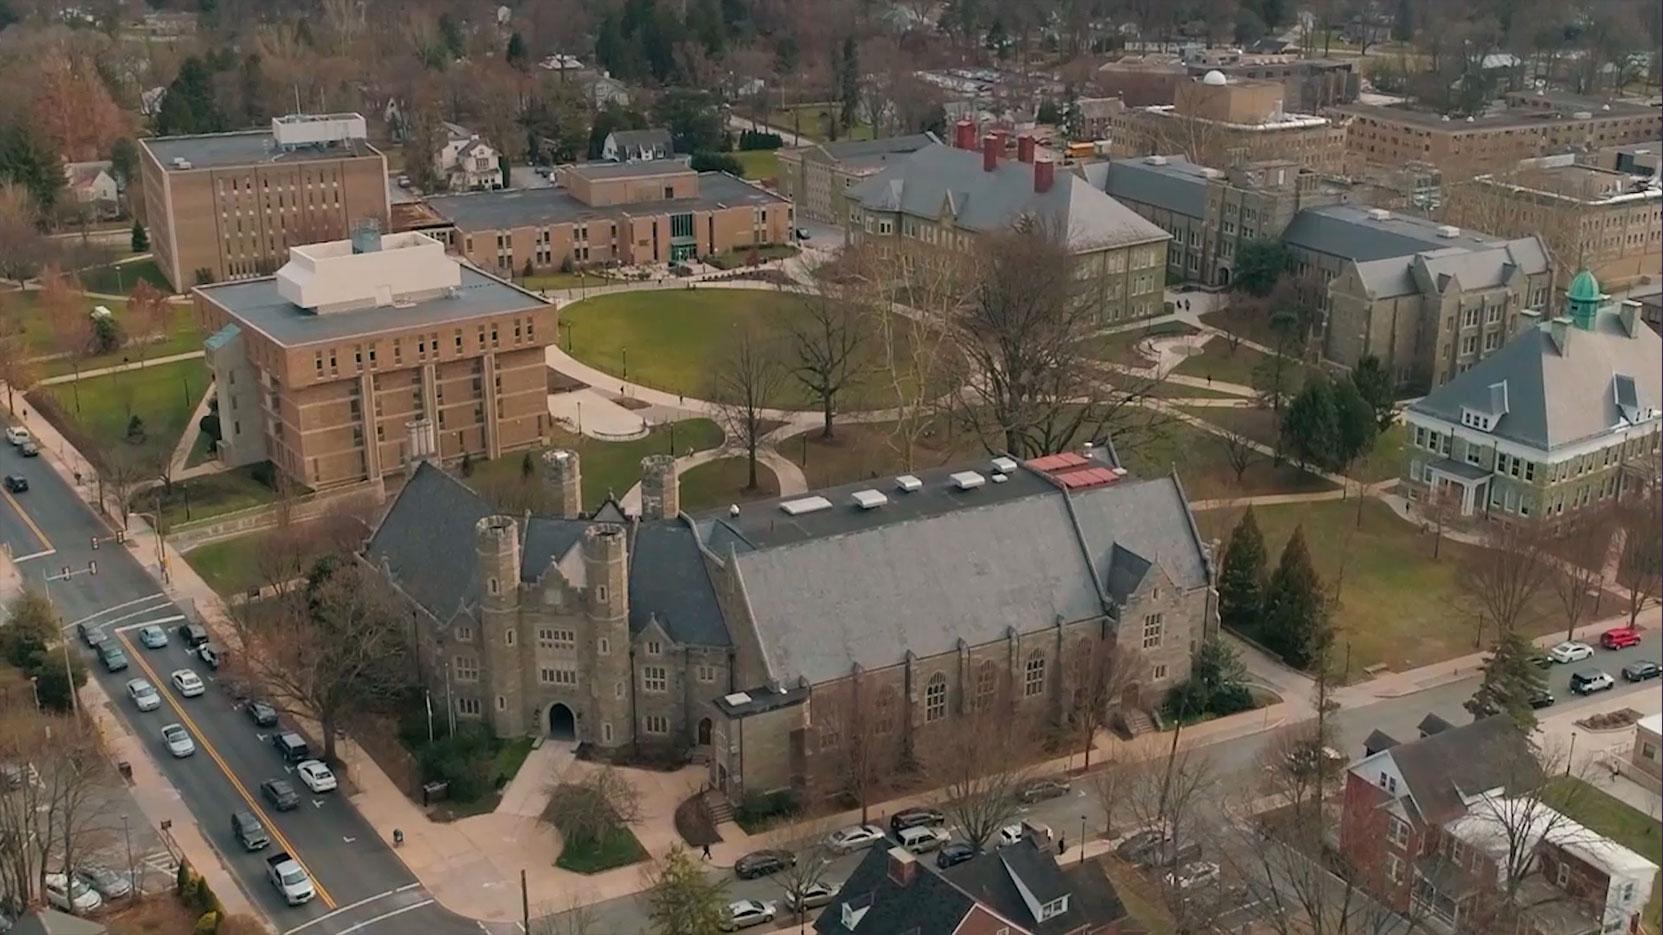 Visit Us West Chester University